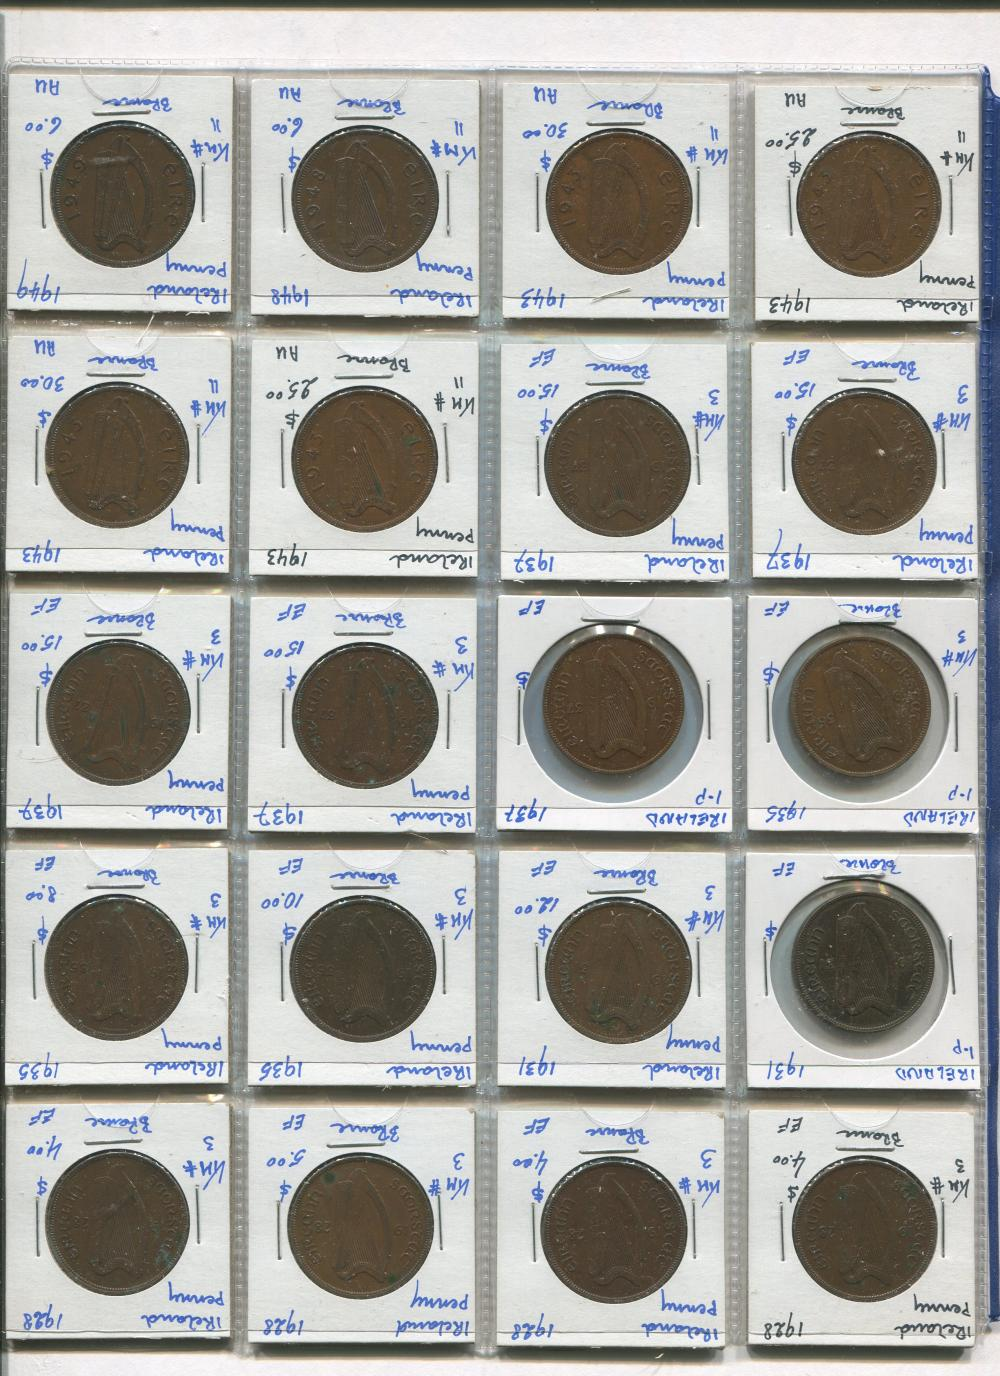 Ireland 1928-49 1 Penny Coin Collection